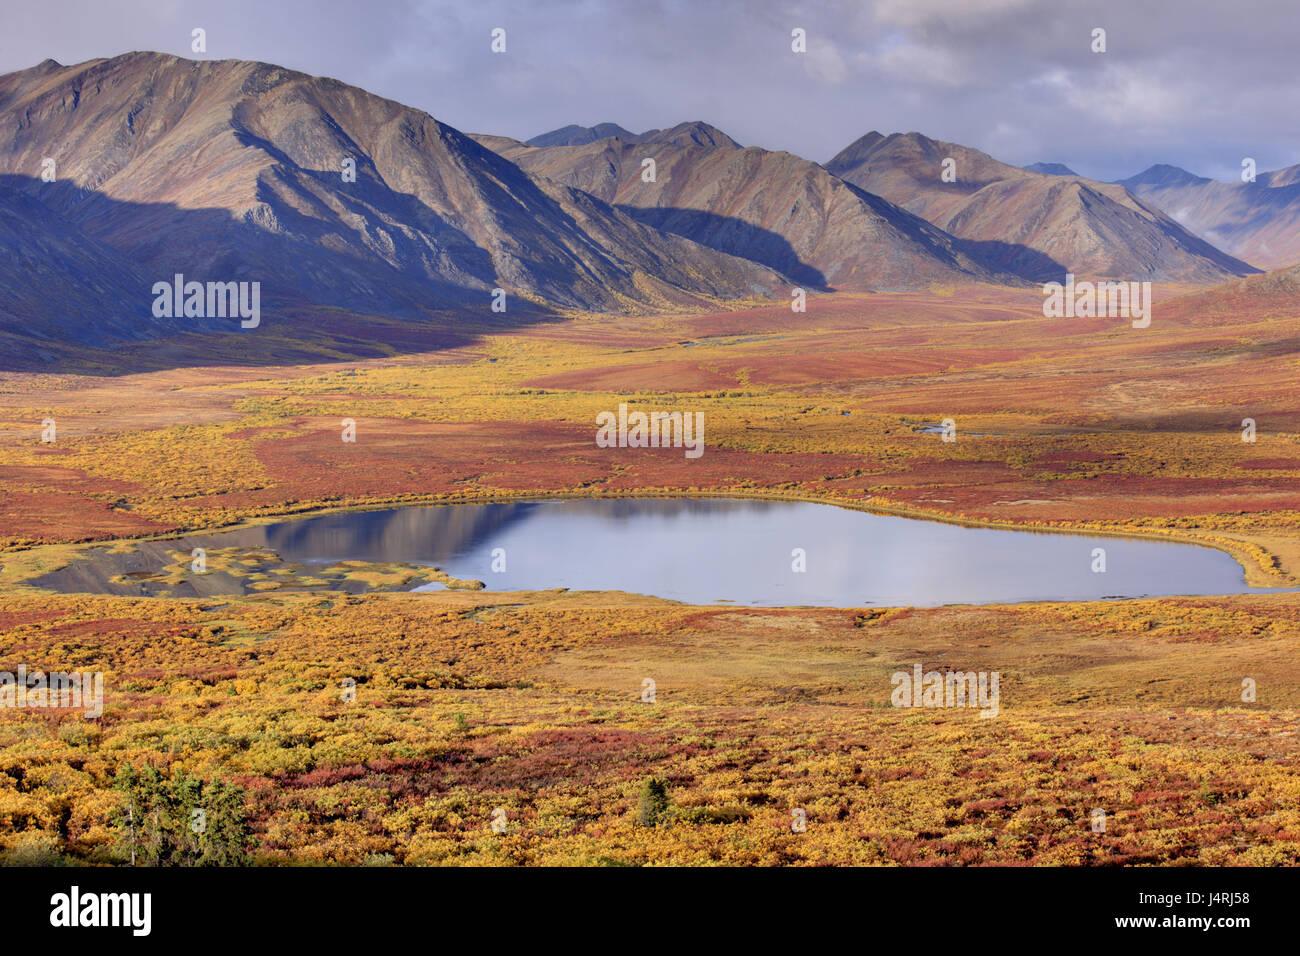 North America, Canada, Yukon territory, Yukon Territory, Dempster highway, Ogilvie Mountains, Tombstone Territorial - Stock Image